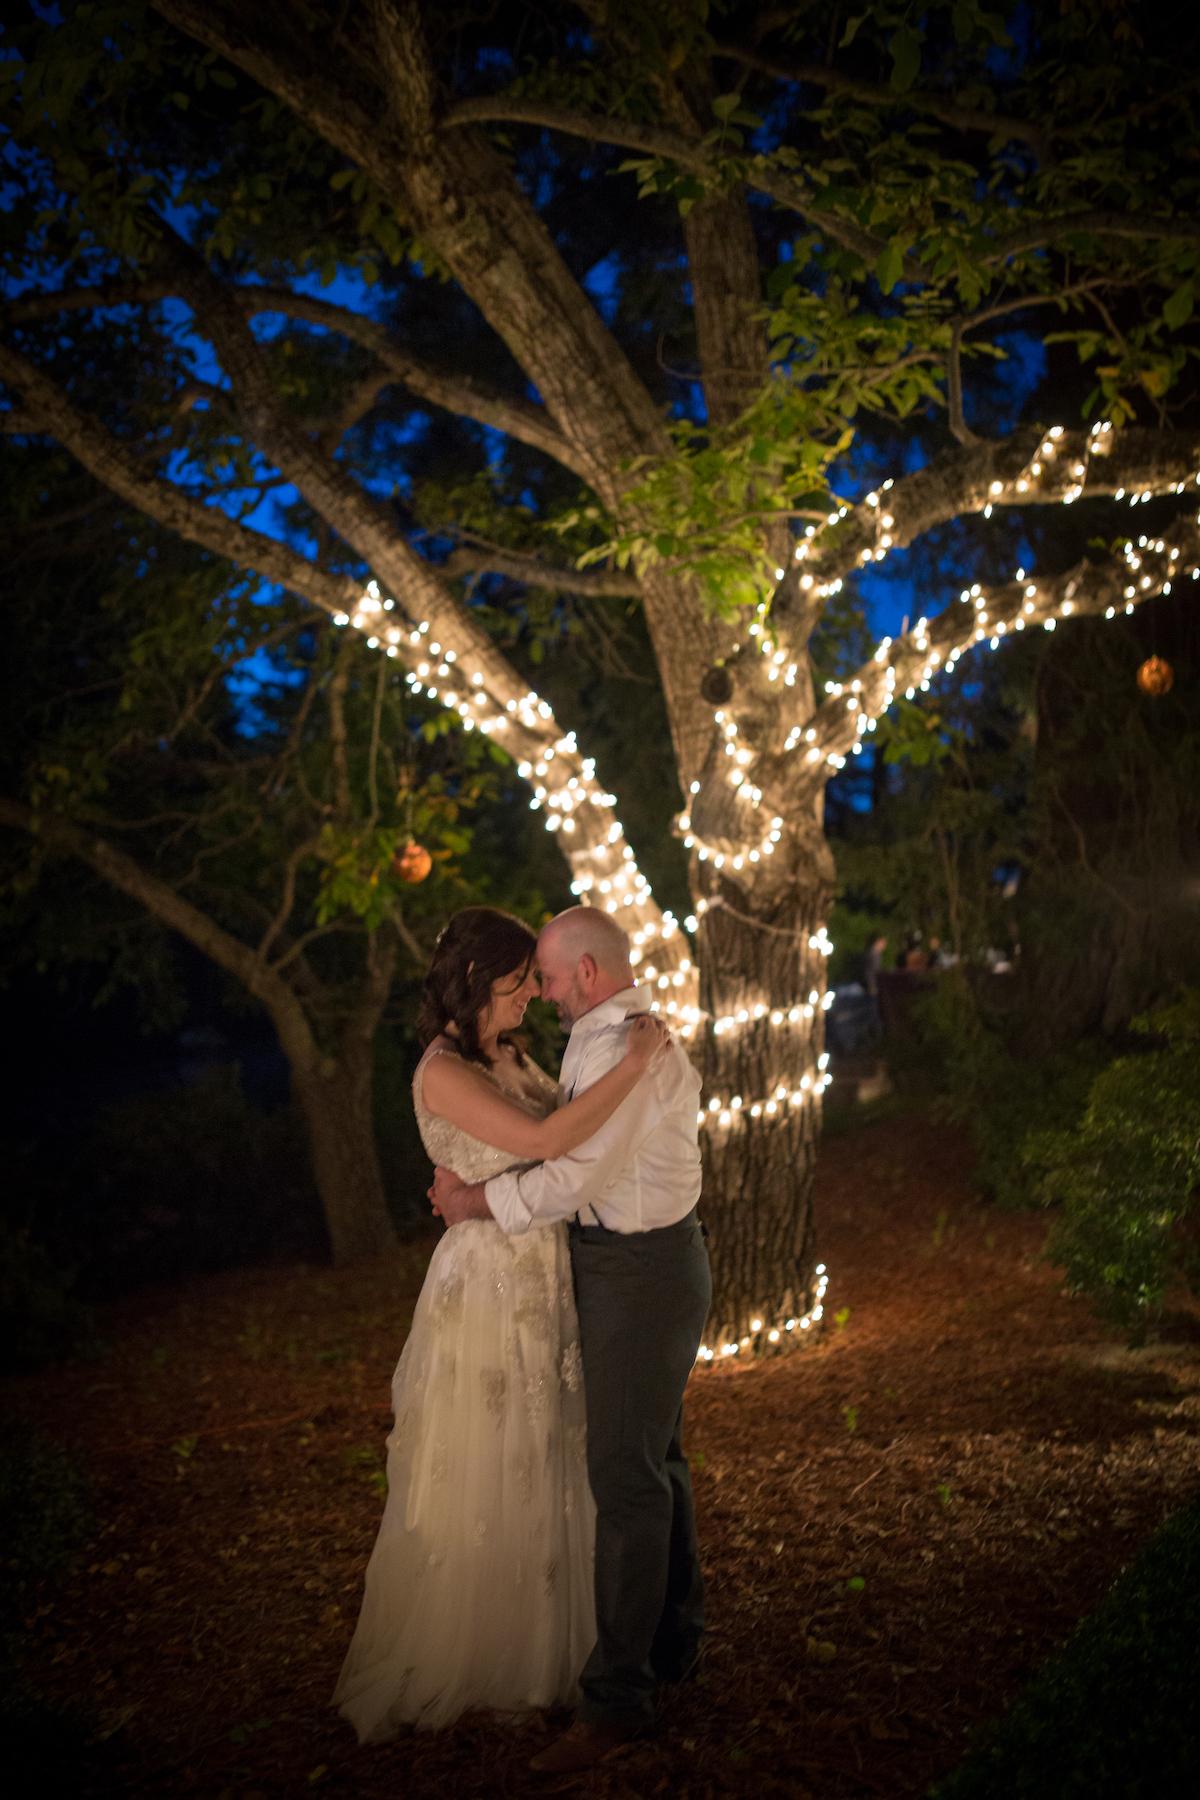 Adam-Jennifer-Wedding-Sarah-Marcella-Marilyn-ambra-party-consultants-497.jpg